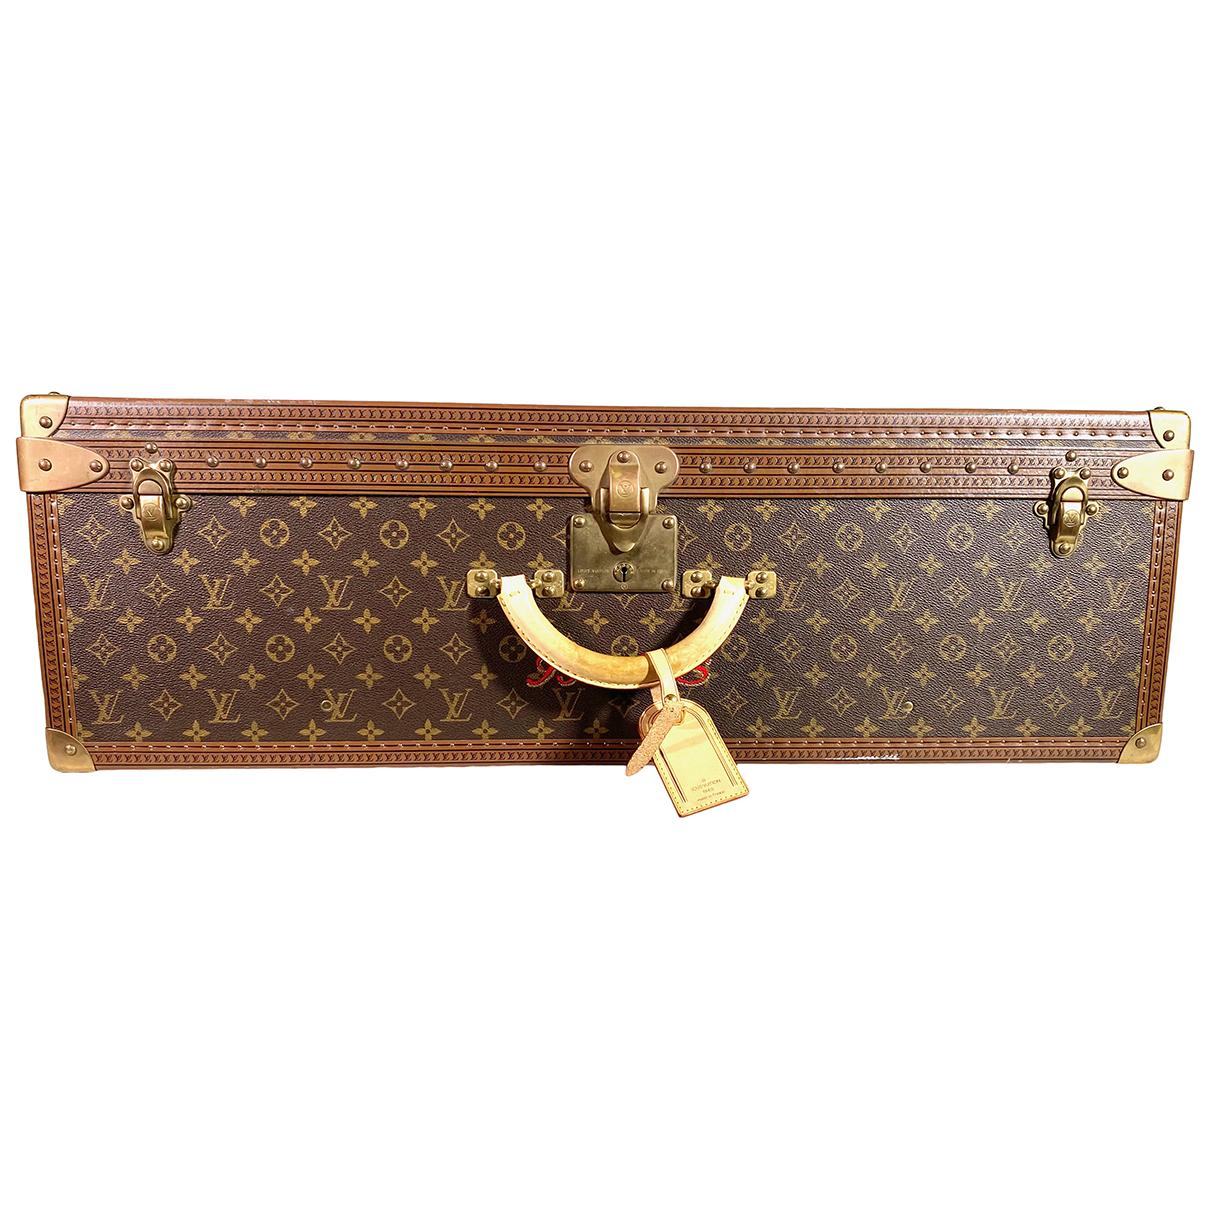 Bolso de viaje Alzer de Lona Louis Vuitton